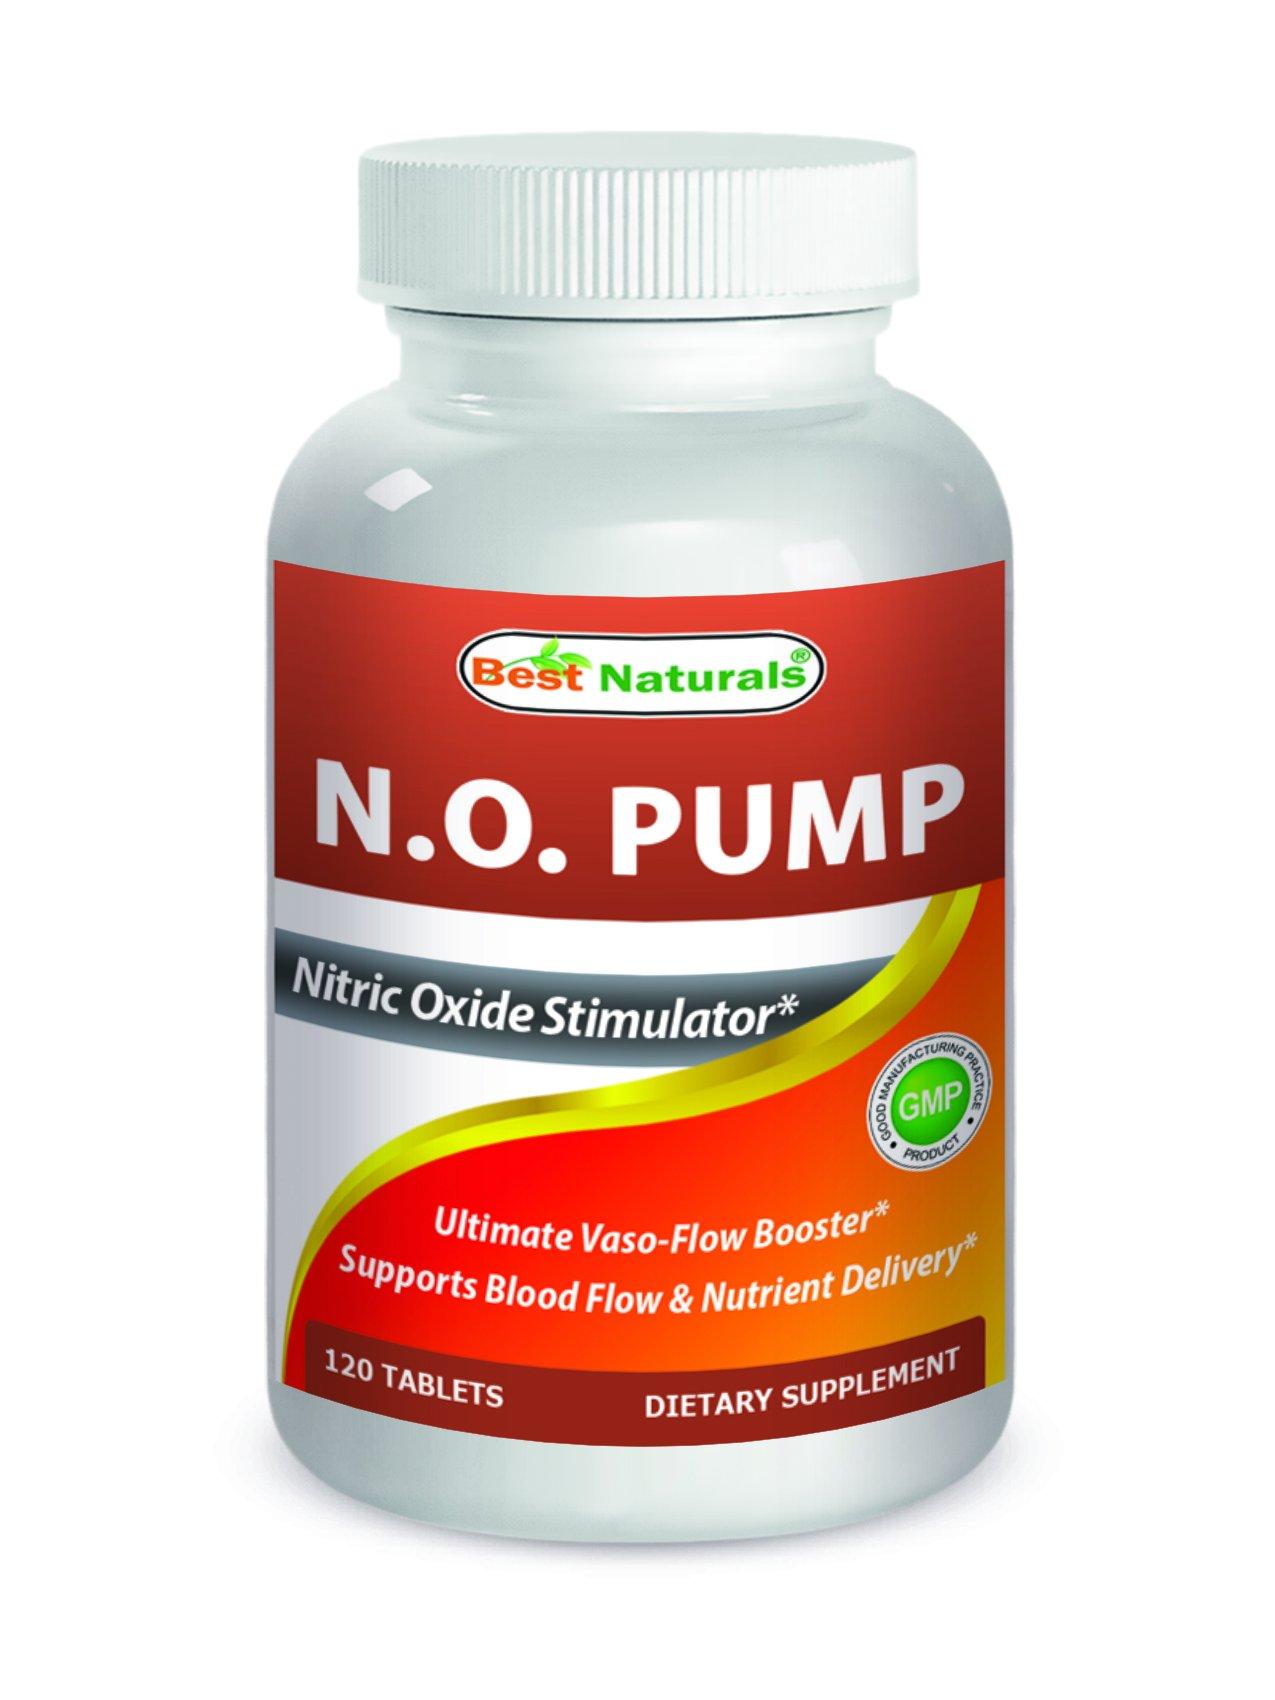 Best Naturals Nitric Oxide NO Pump 3000 mg per Serving 120 Tablets by Best Naturals